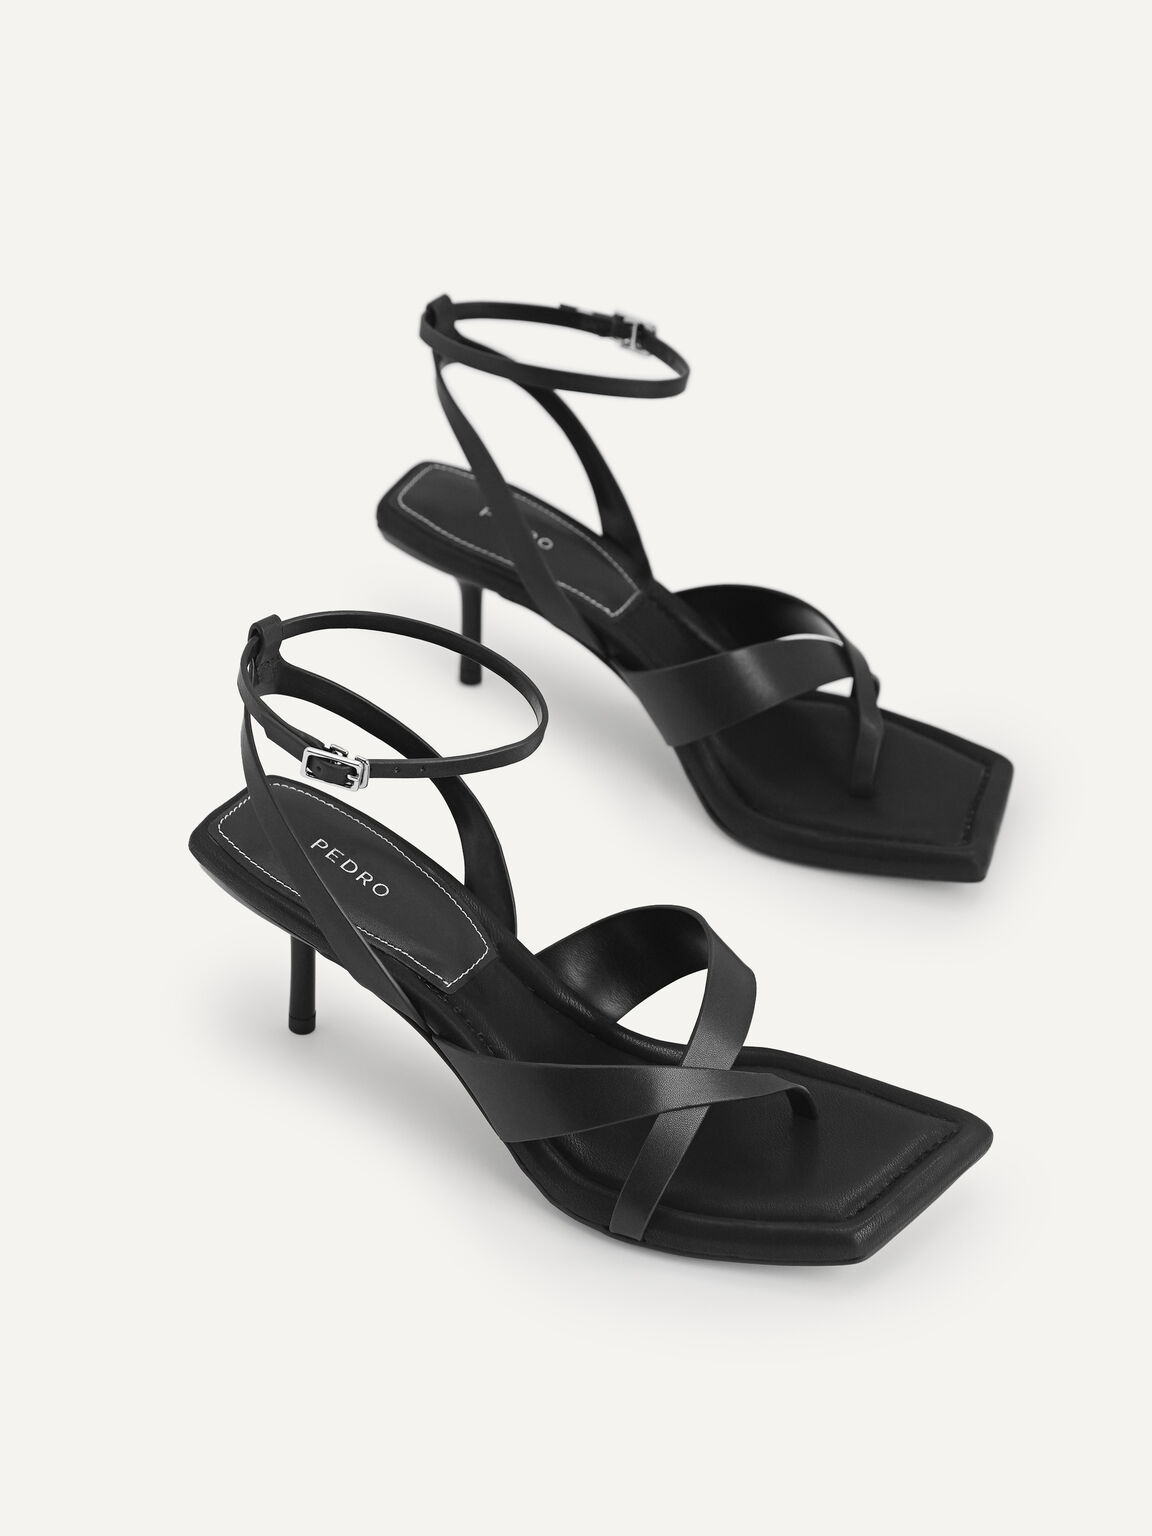 Strappy Square-Toe Heeled Sandals, Black, hi-res